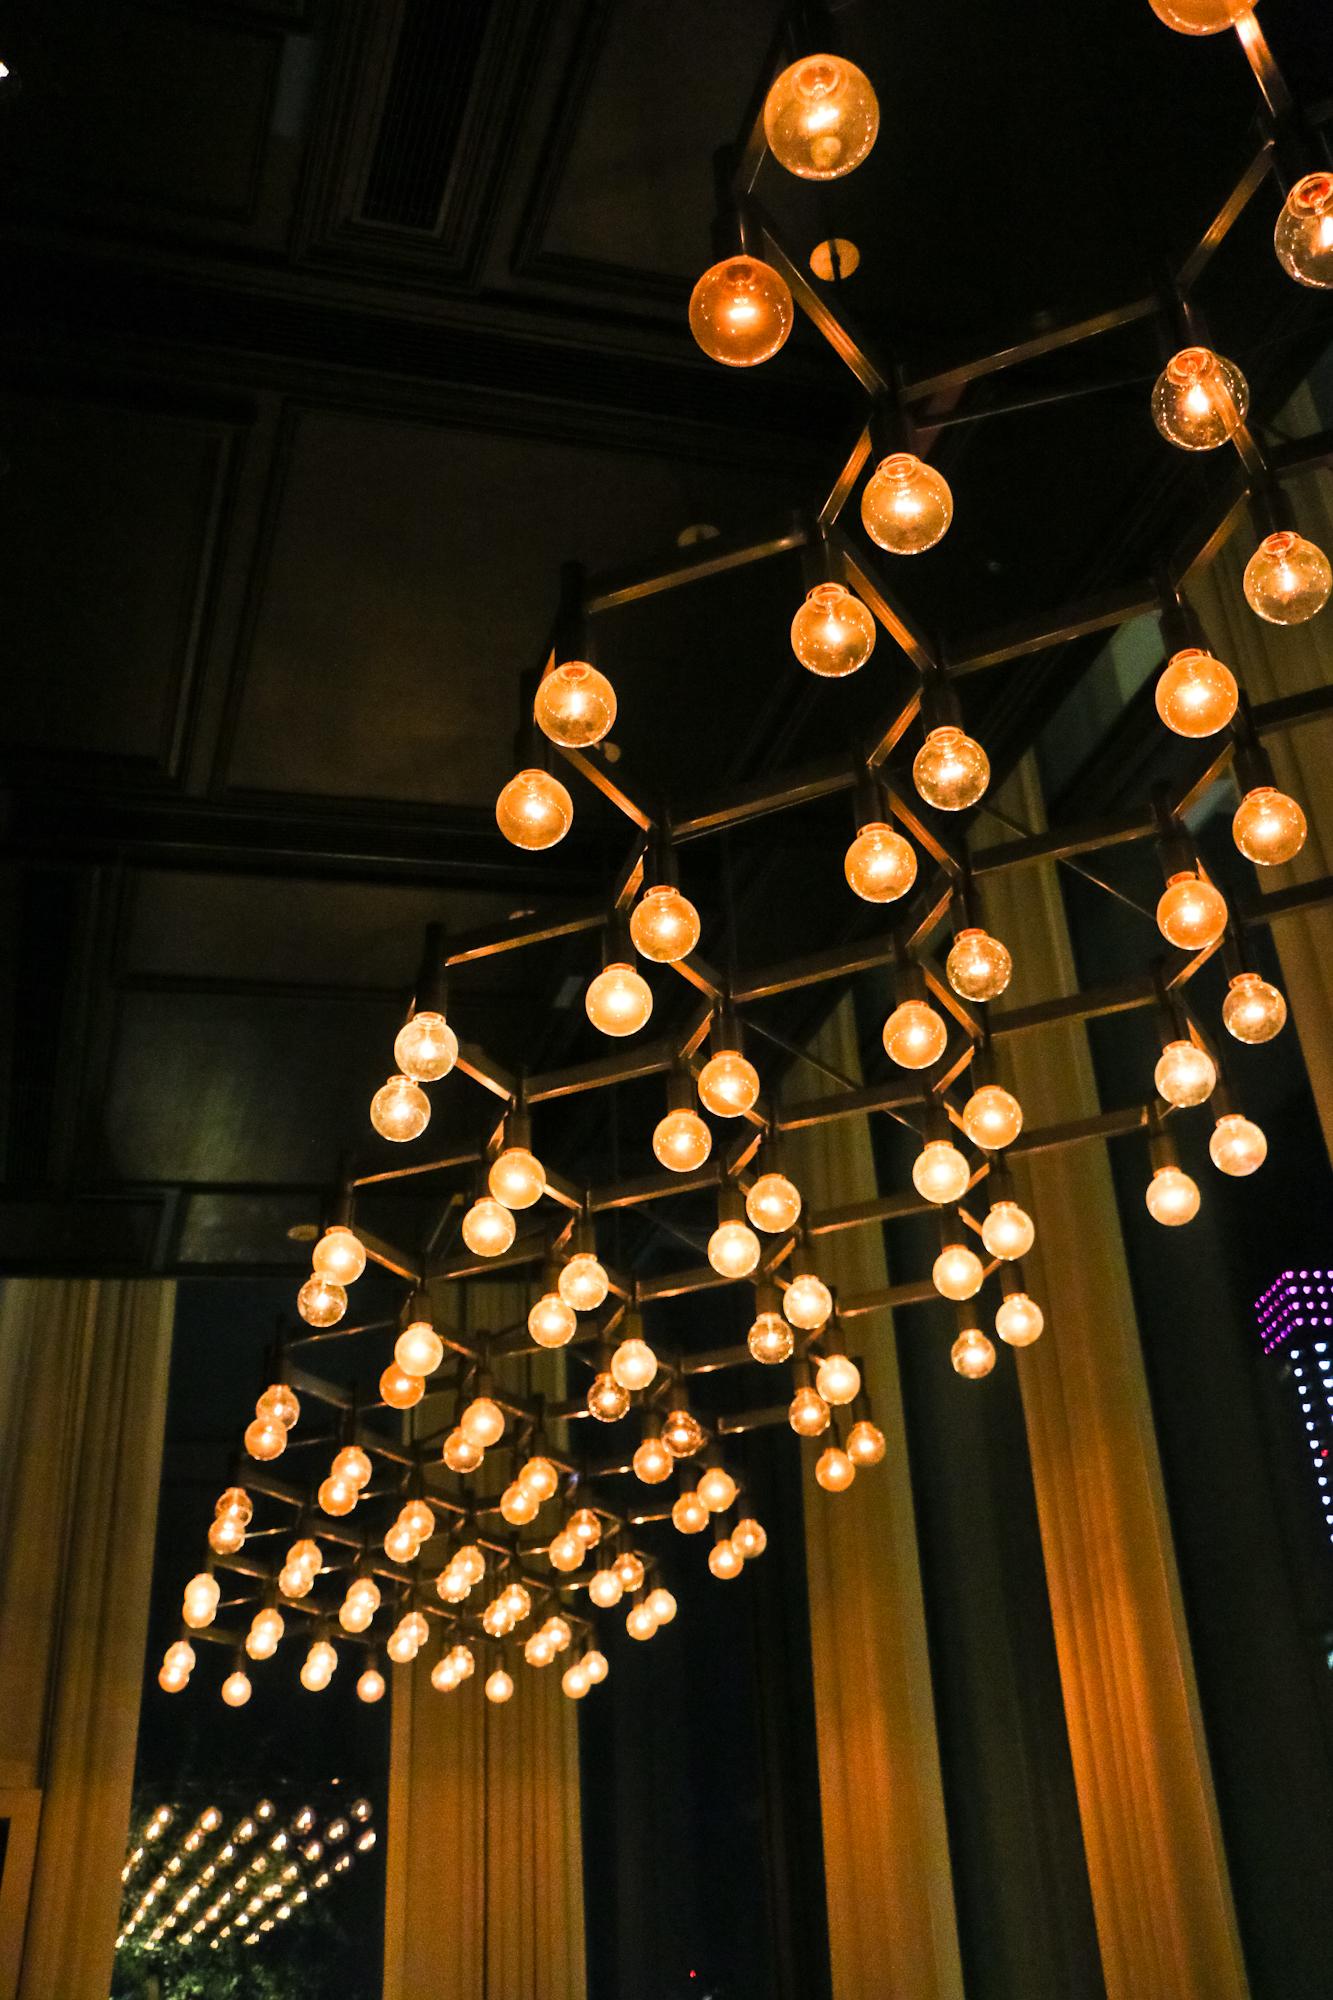 Restaurant, Shin-Marunouchi Building, Tokyo